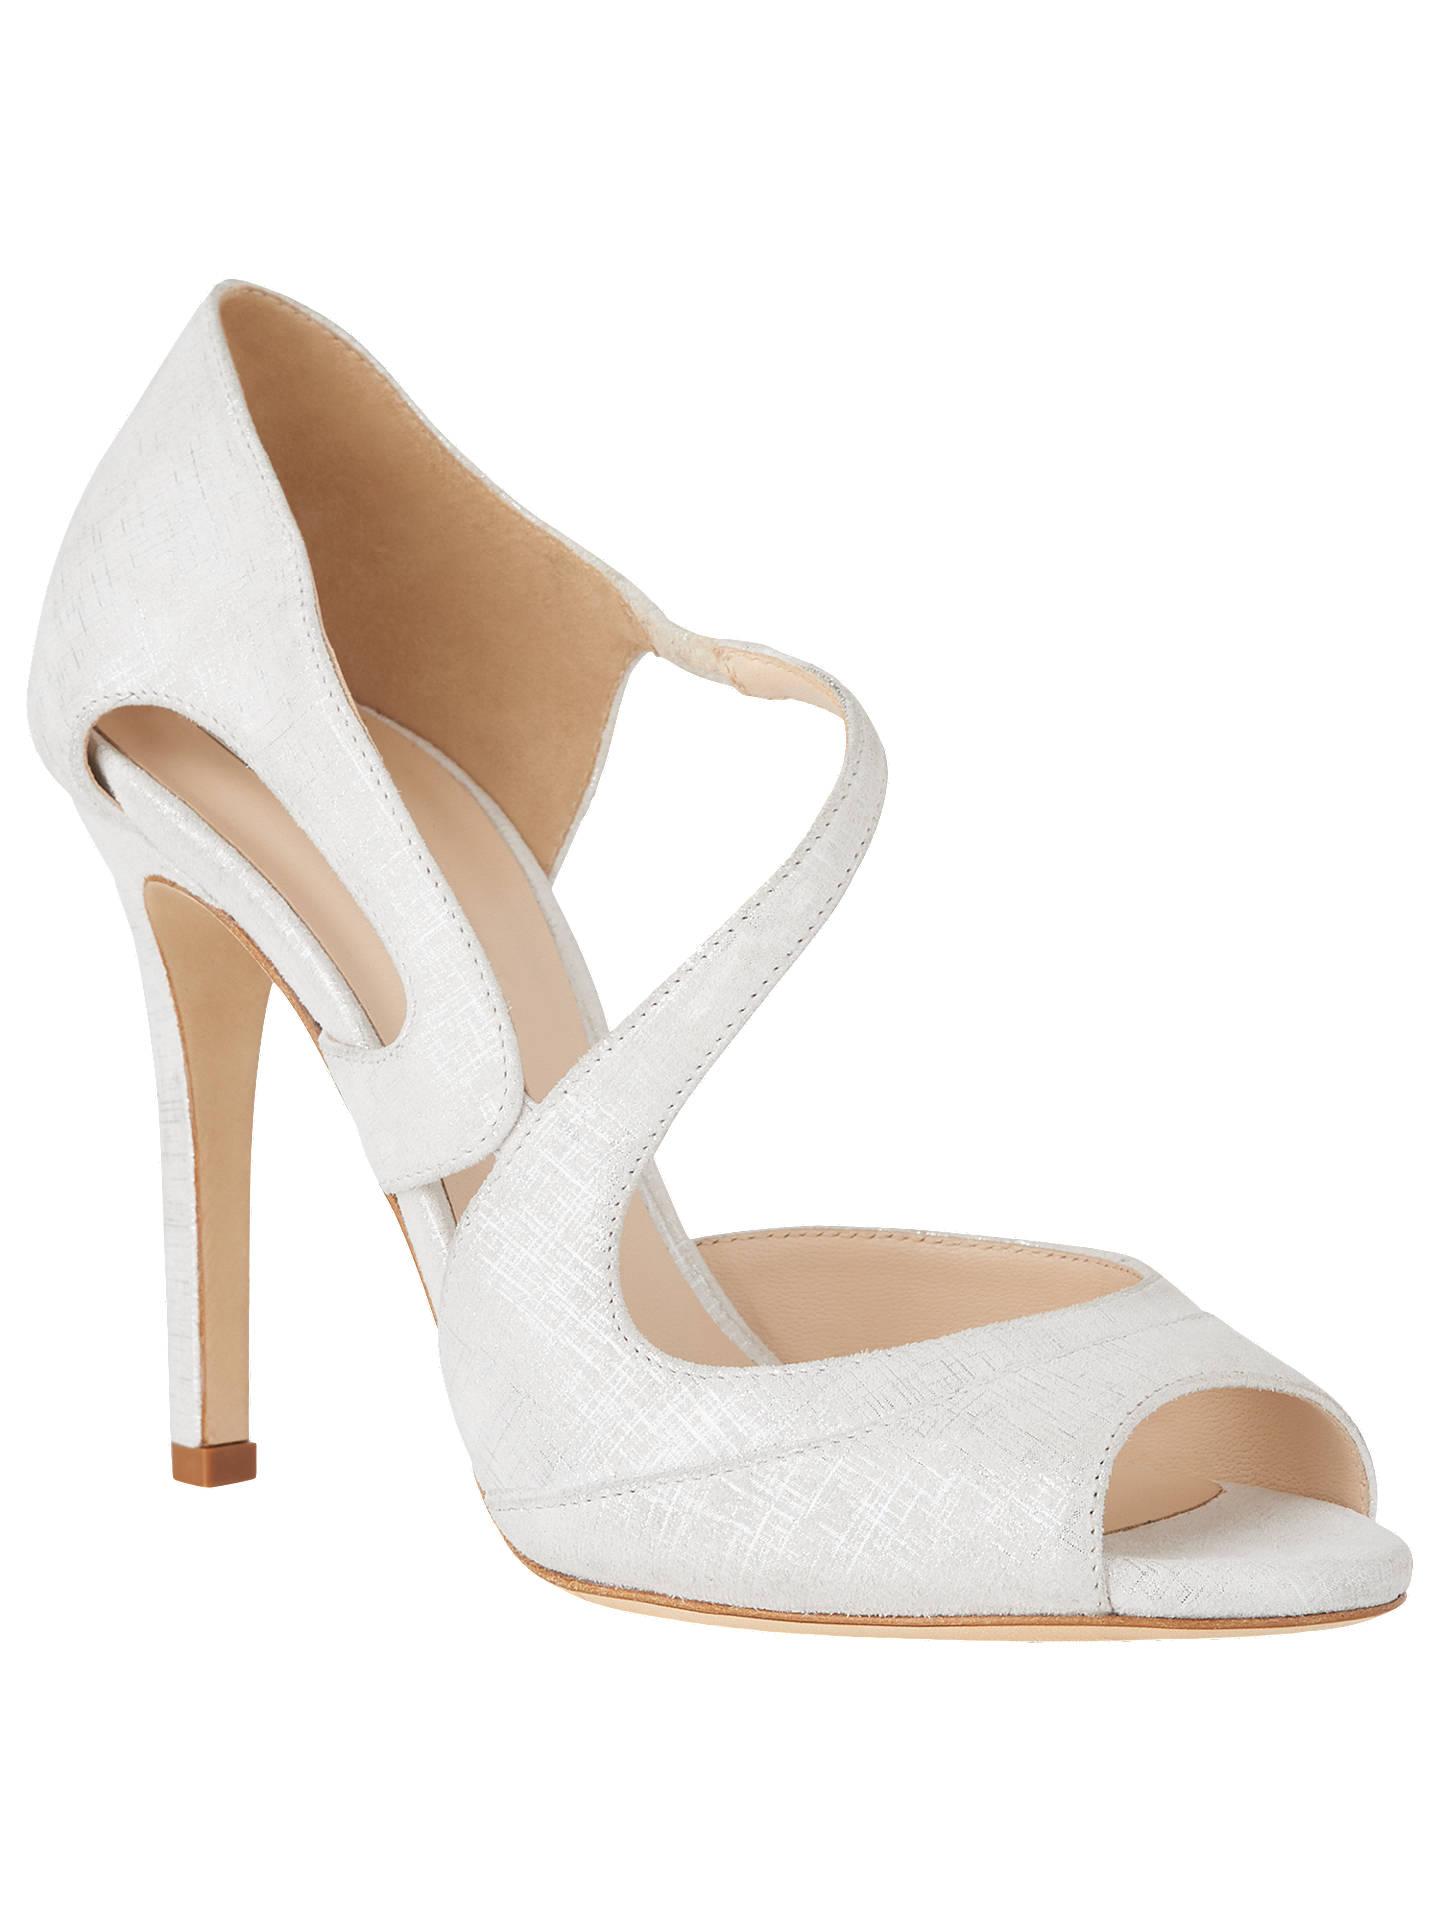 55c174971a89b9 Buy L.K. Bennett Valentina Stiletto Heeled Sandals